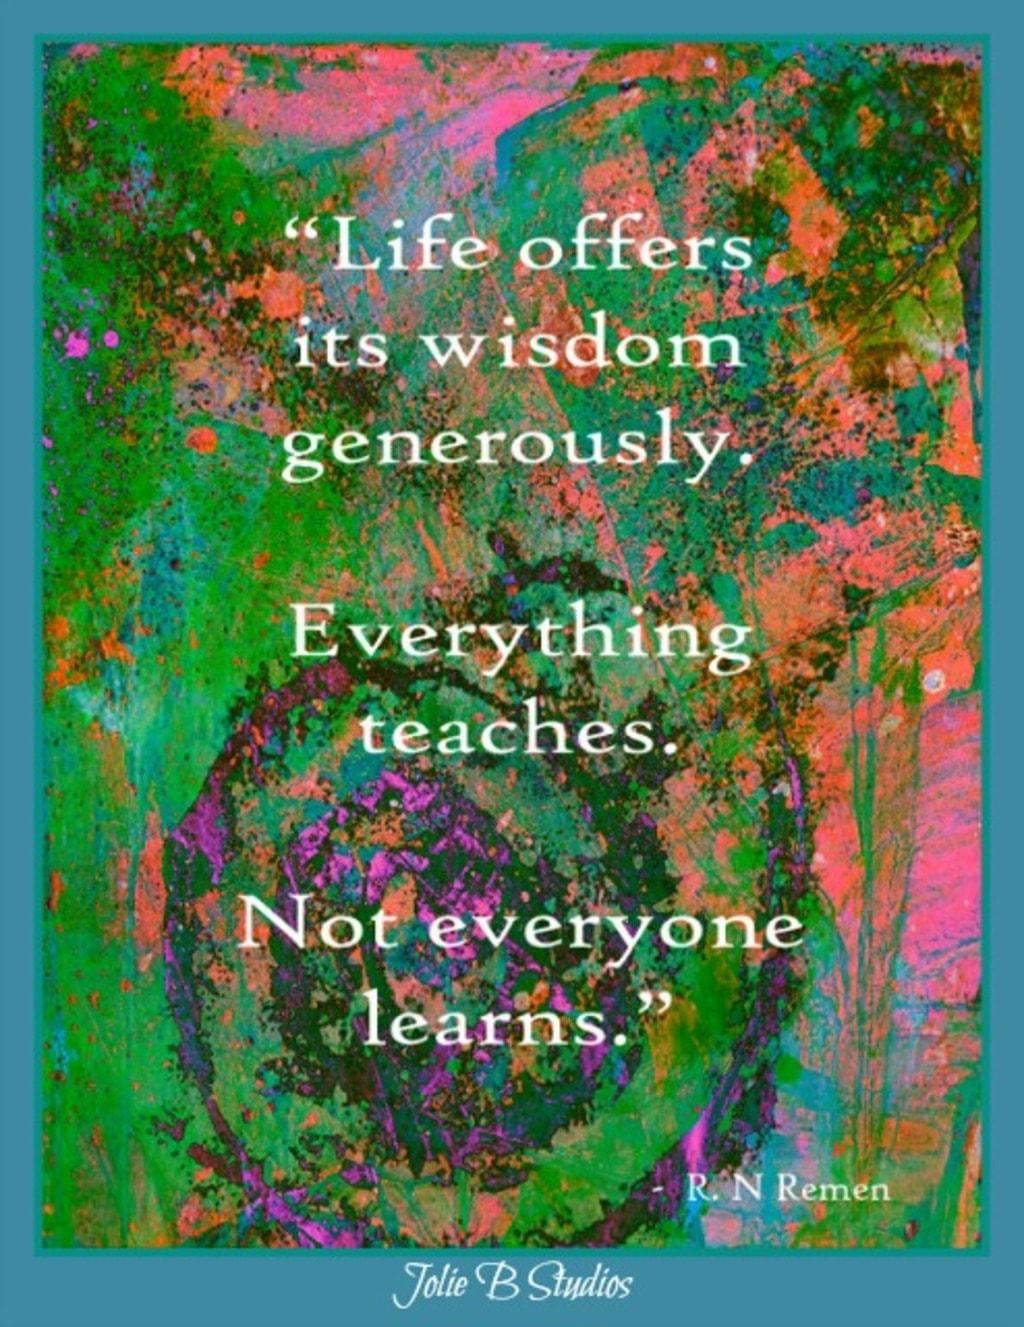 Life's Wisdom via Jolie Buchanan